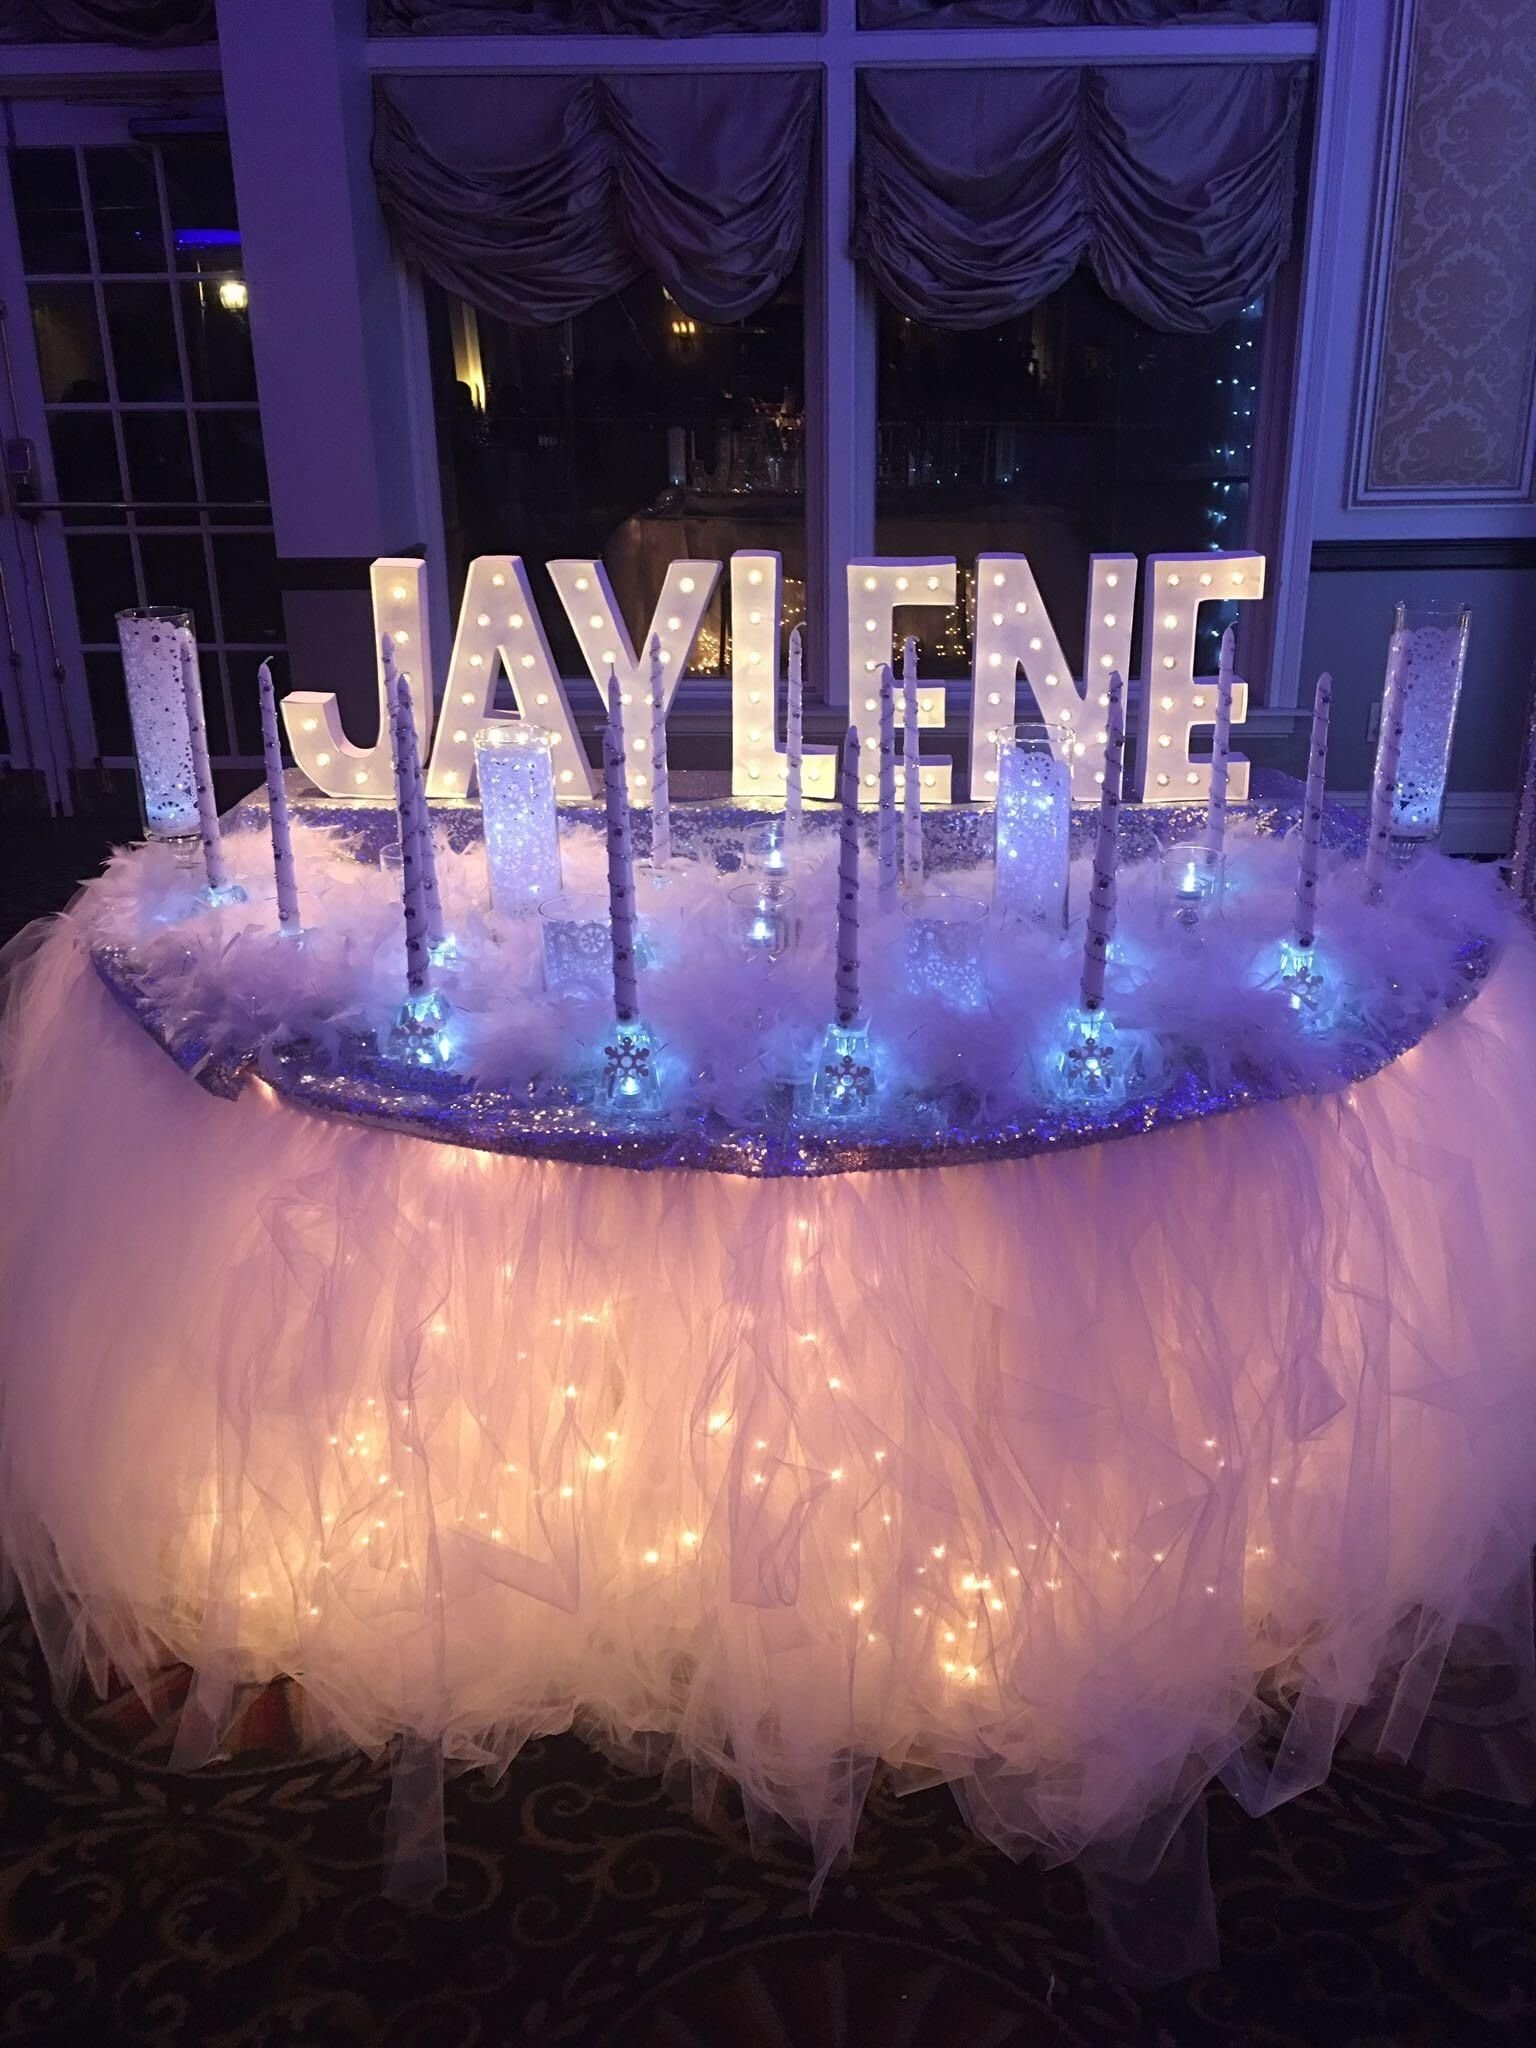 10 Fantastic Sweet 16 Birthday Party Ideas candle ceremony set up winter wonderland sweet 16 winter 6 2021